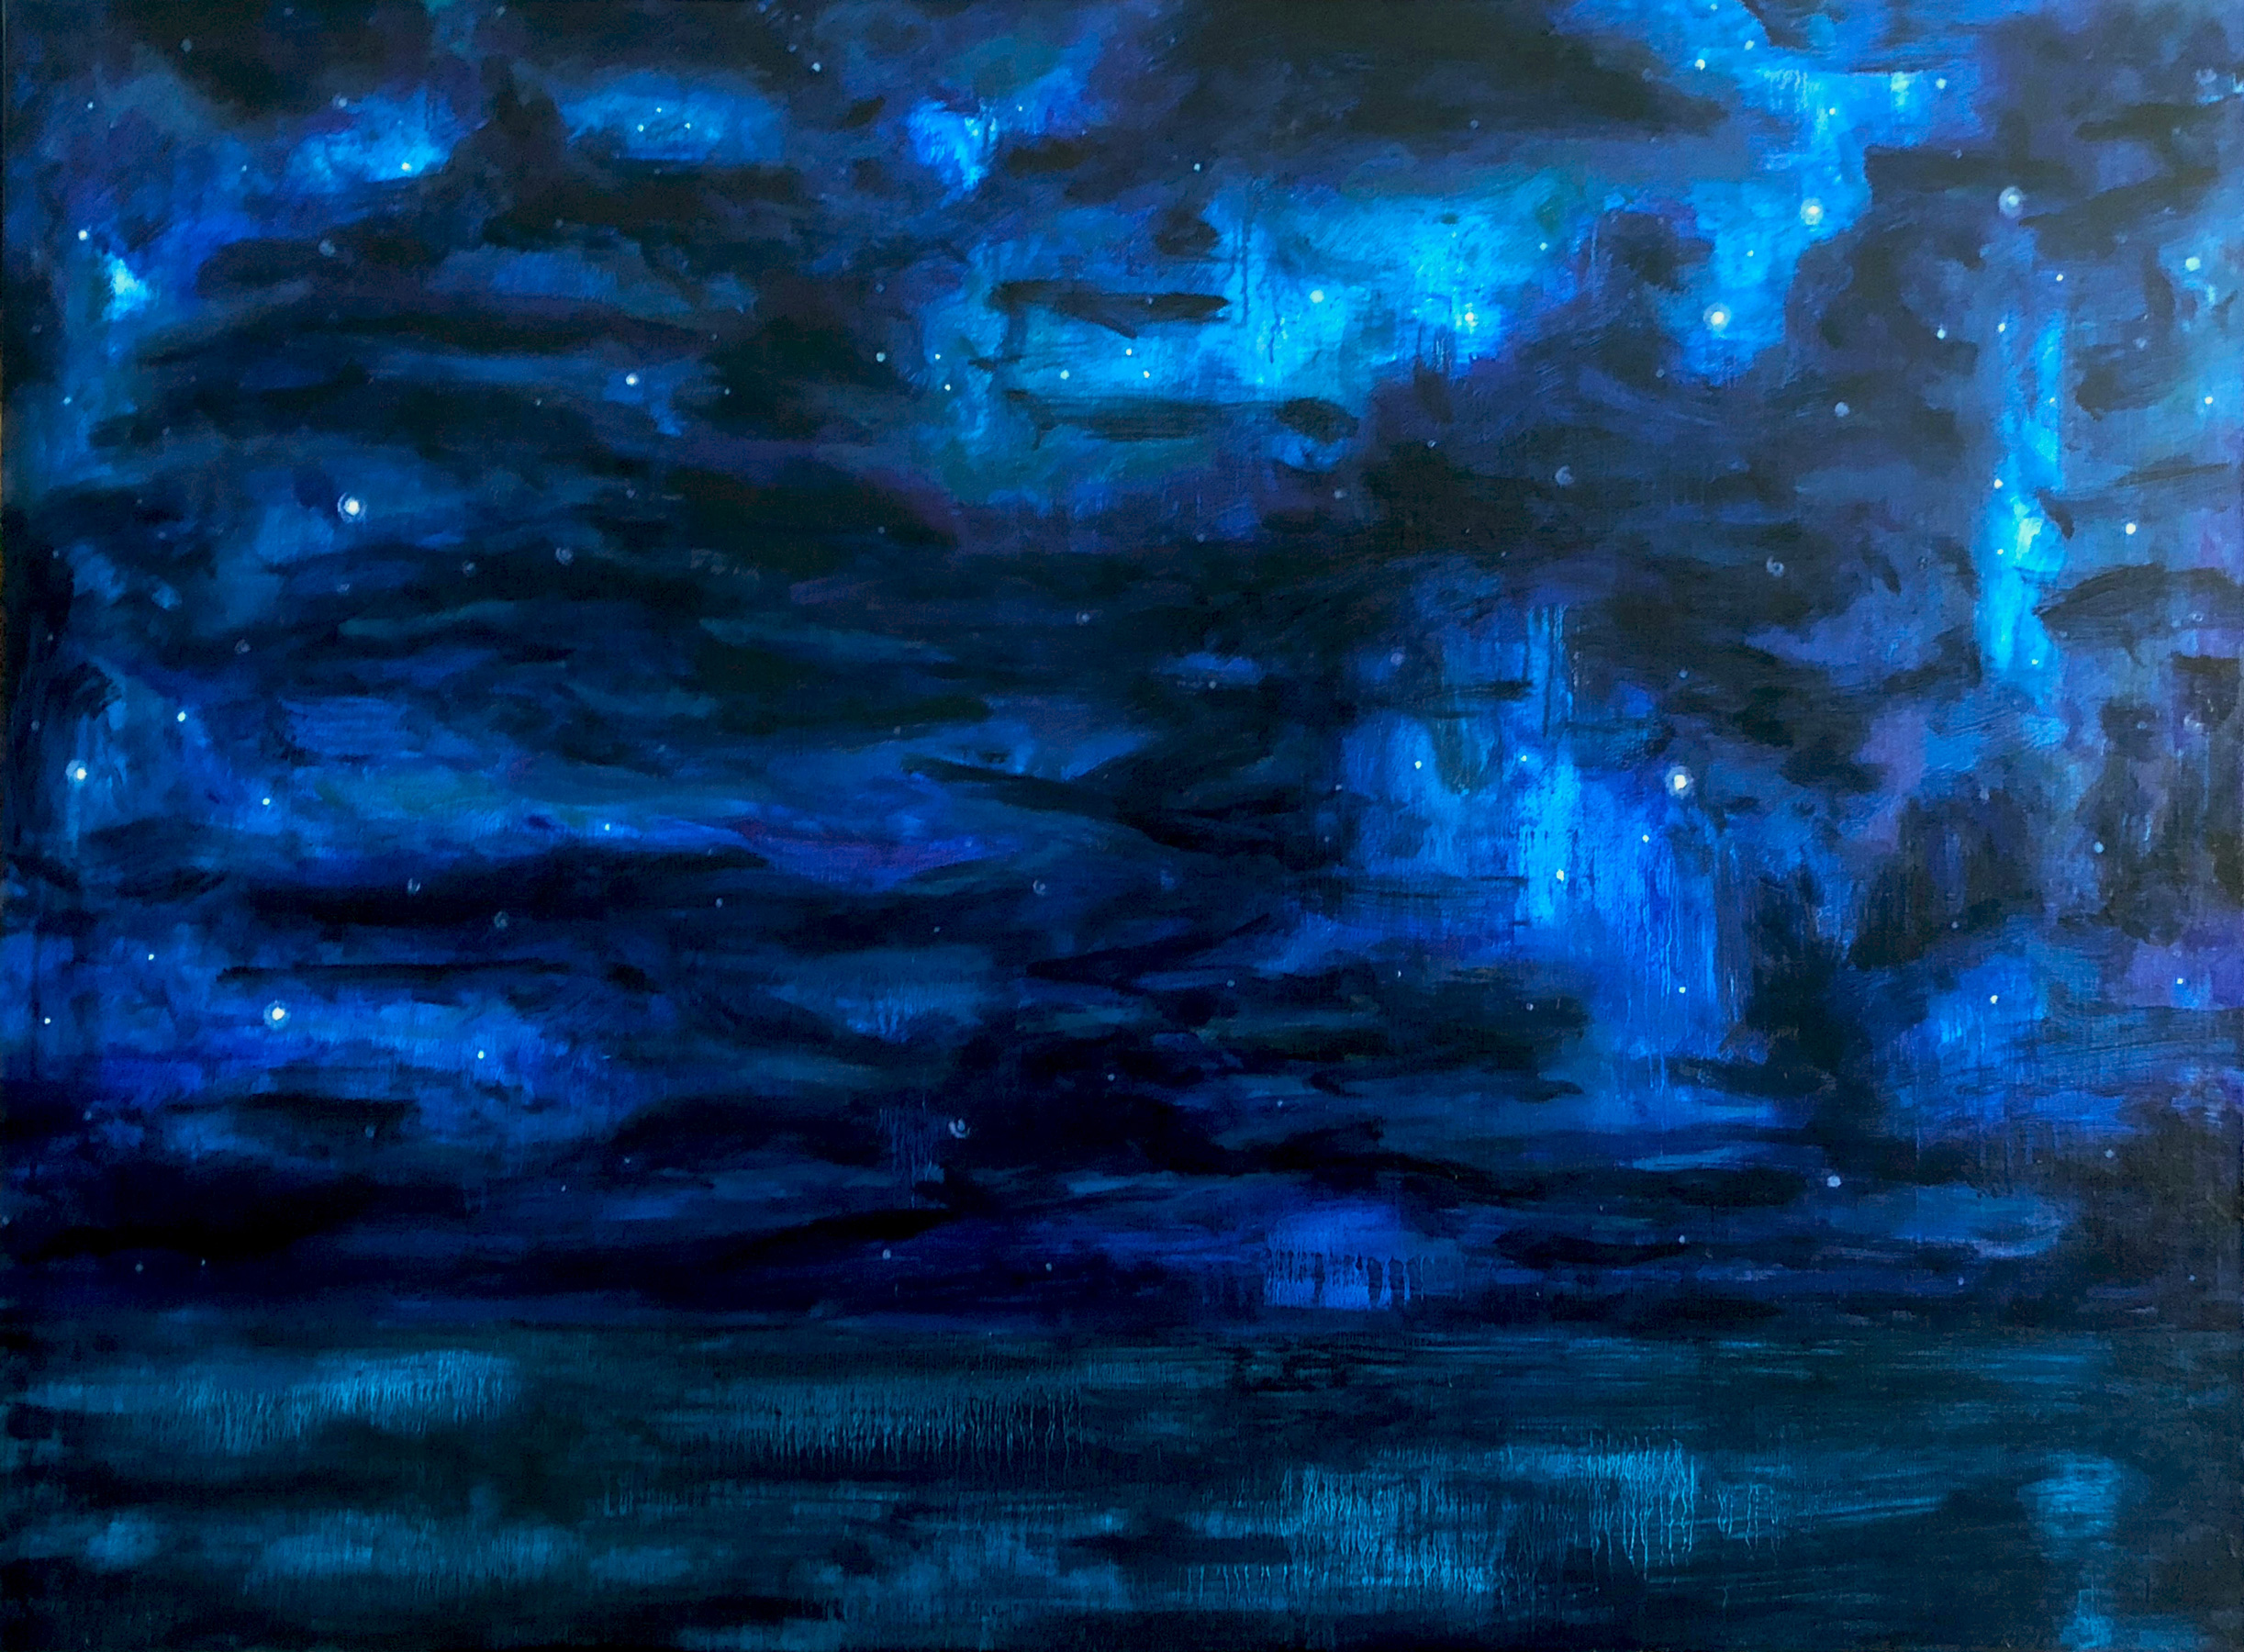 St. John's Heavens and Stars 8